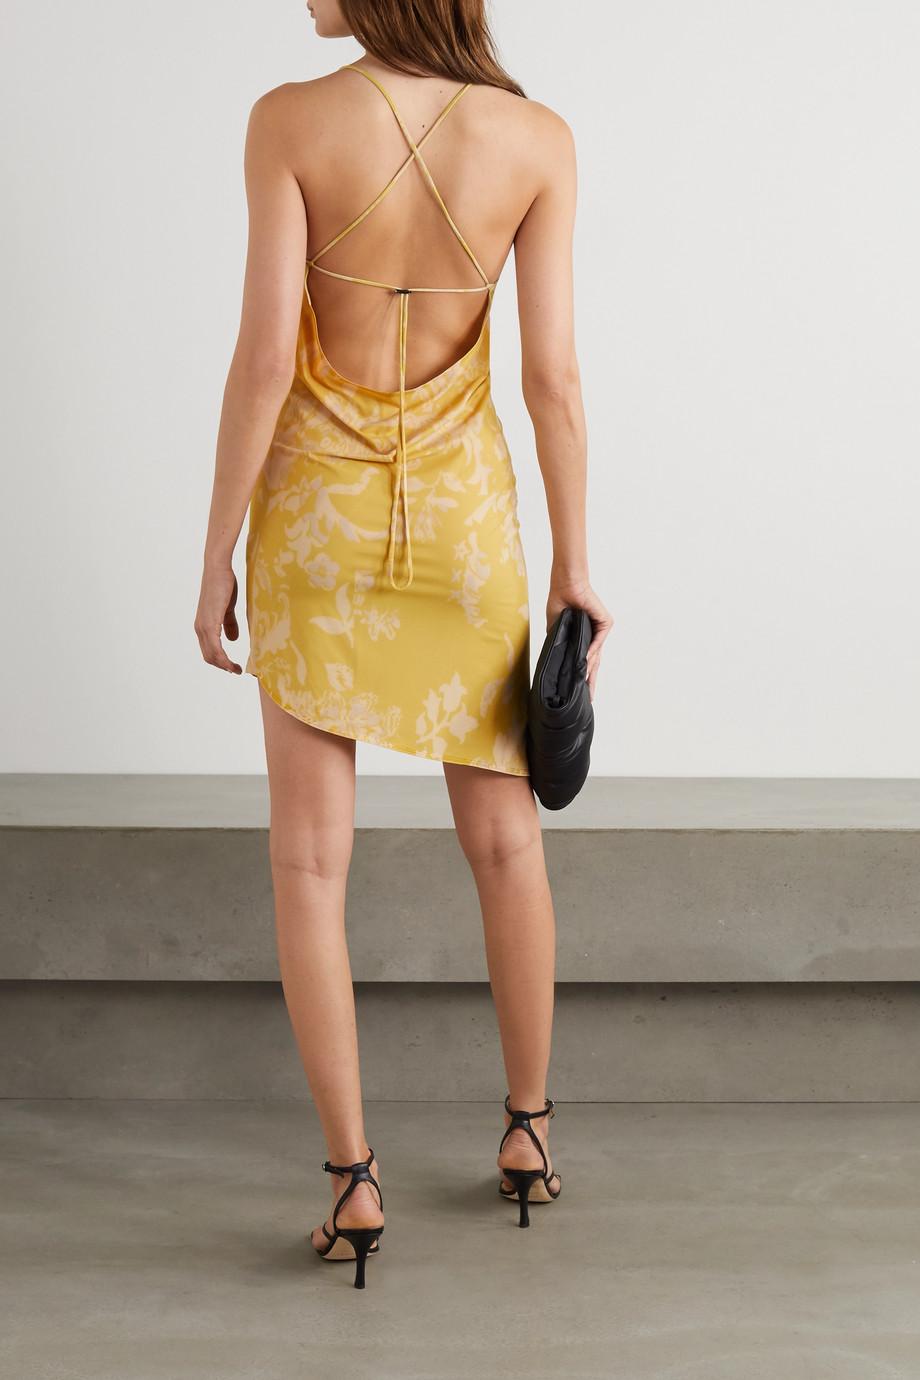 Fashion Forms Voluptuous U-Plunge 自粘式露背无肩带文胸